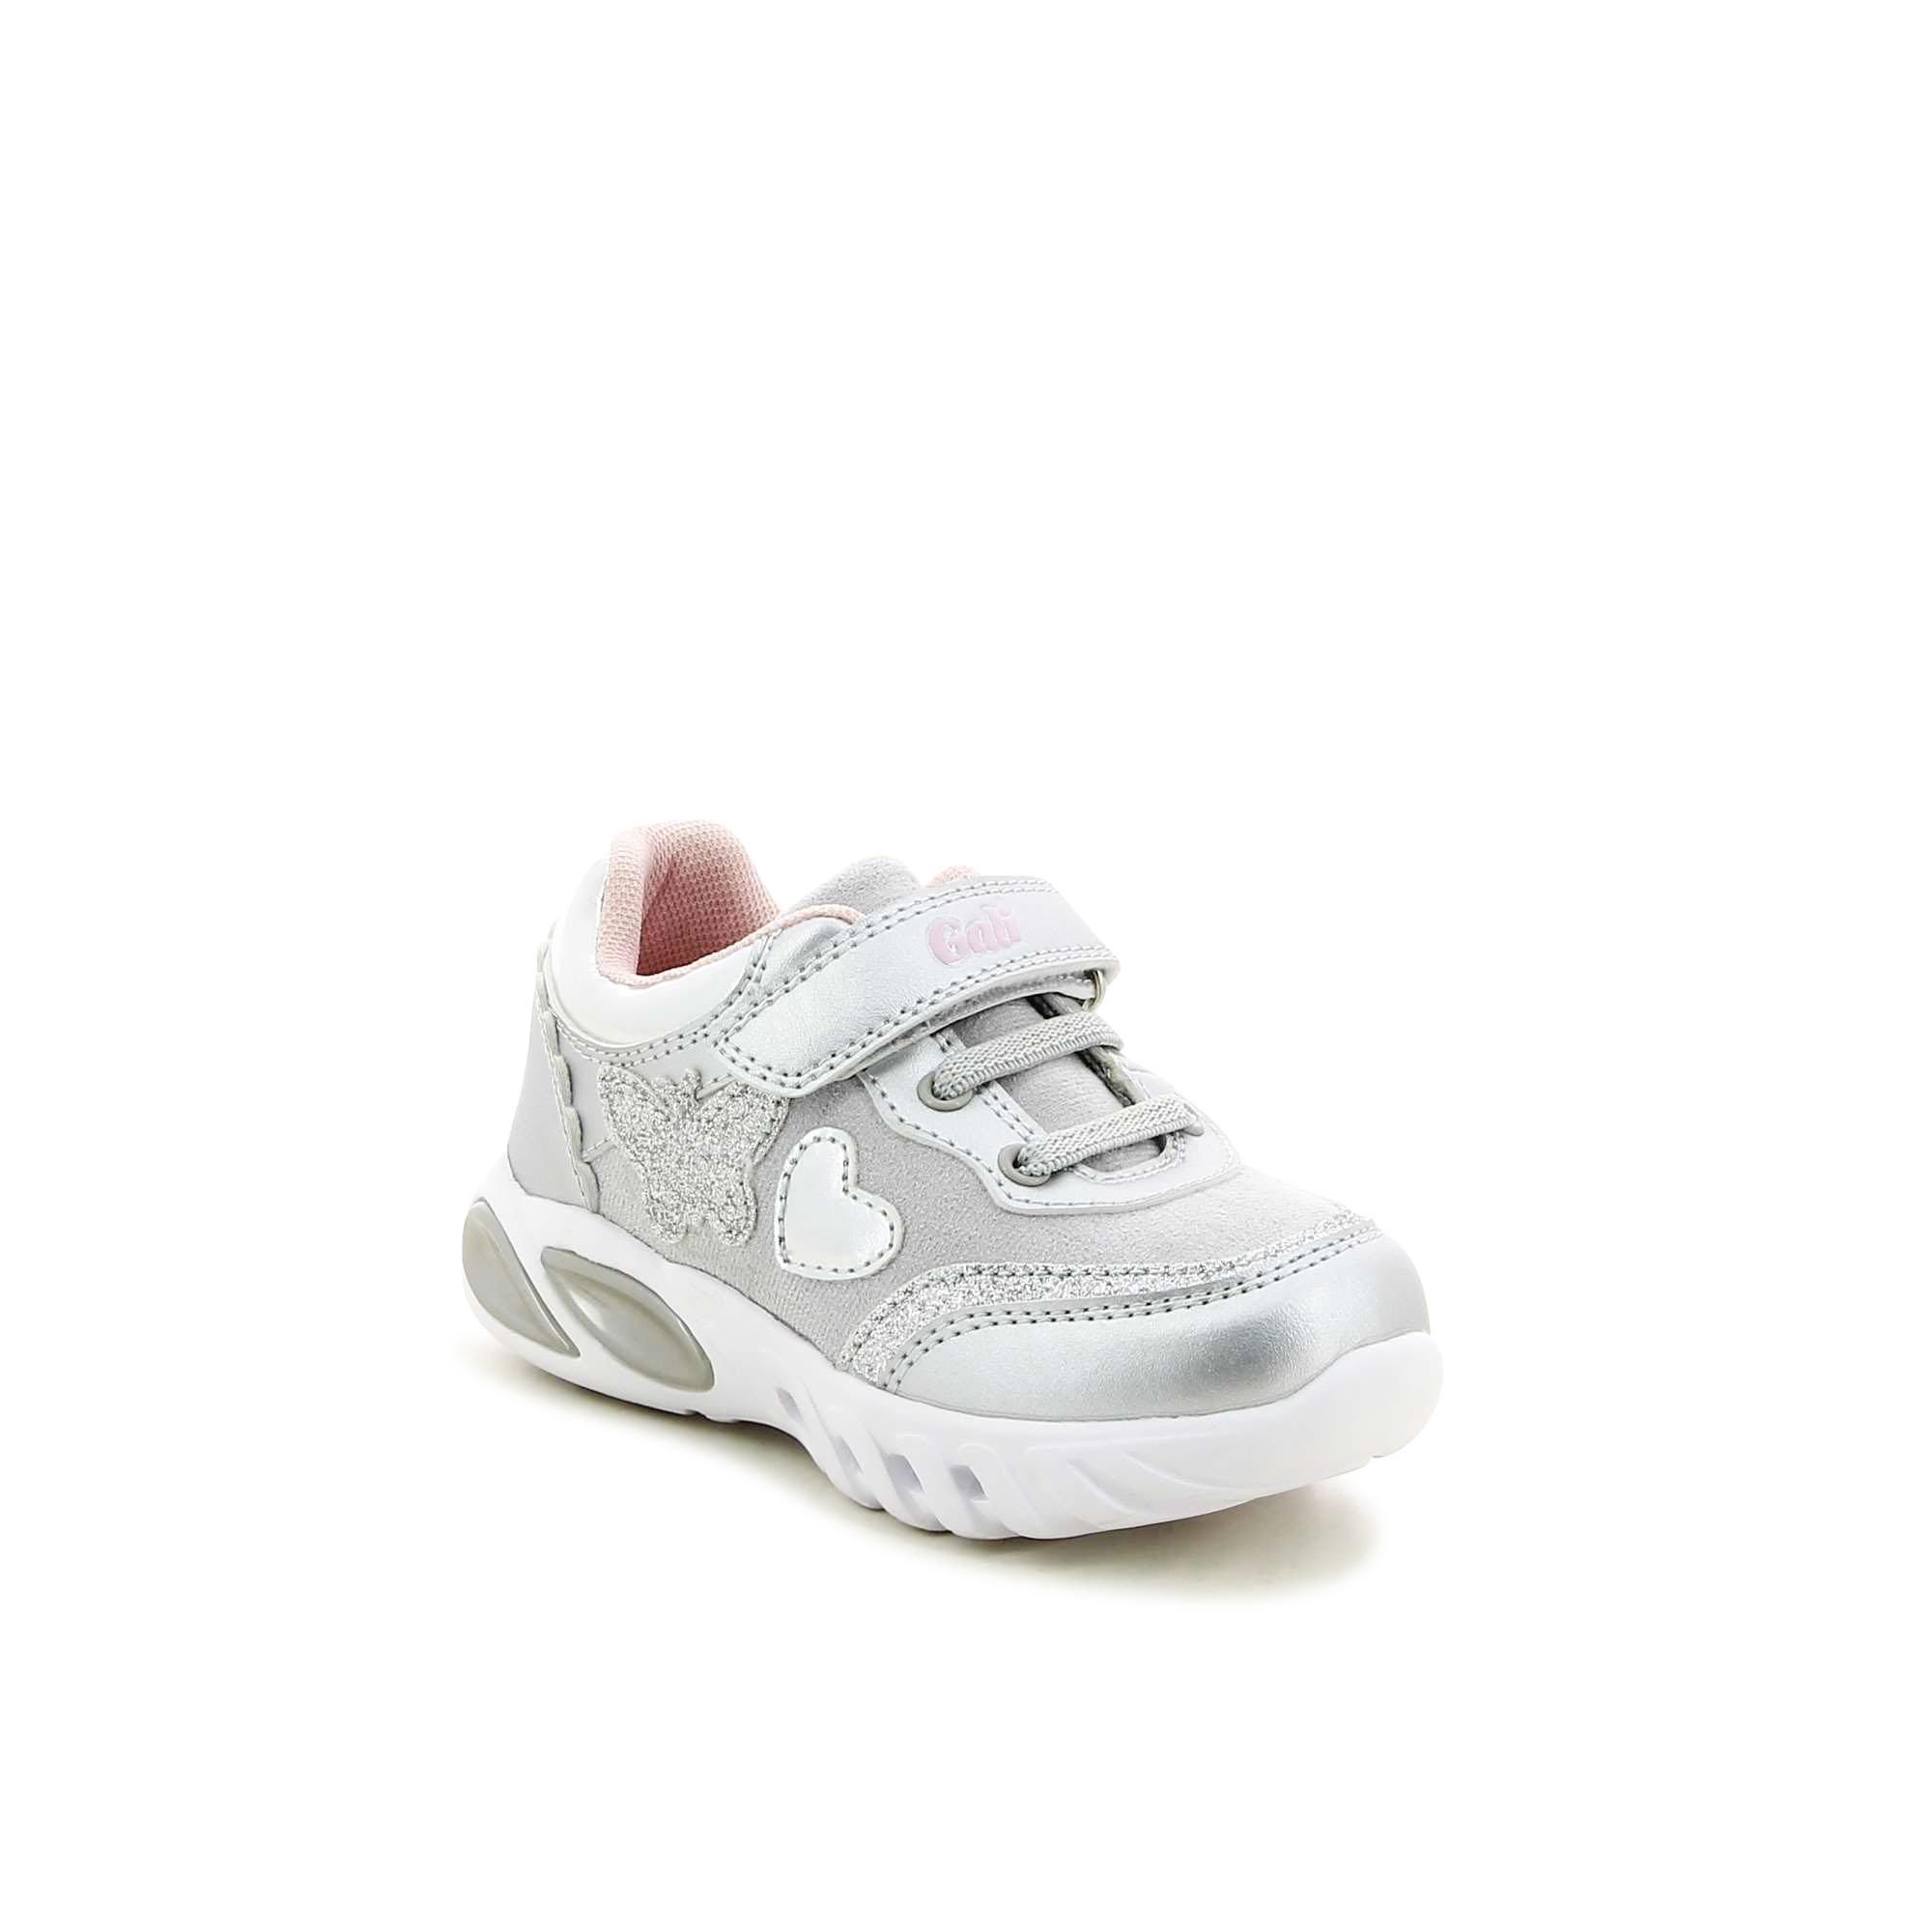 נעלי ספורט עם פרפר